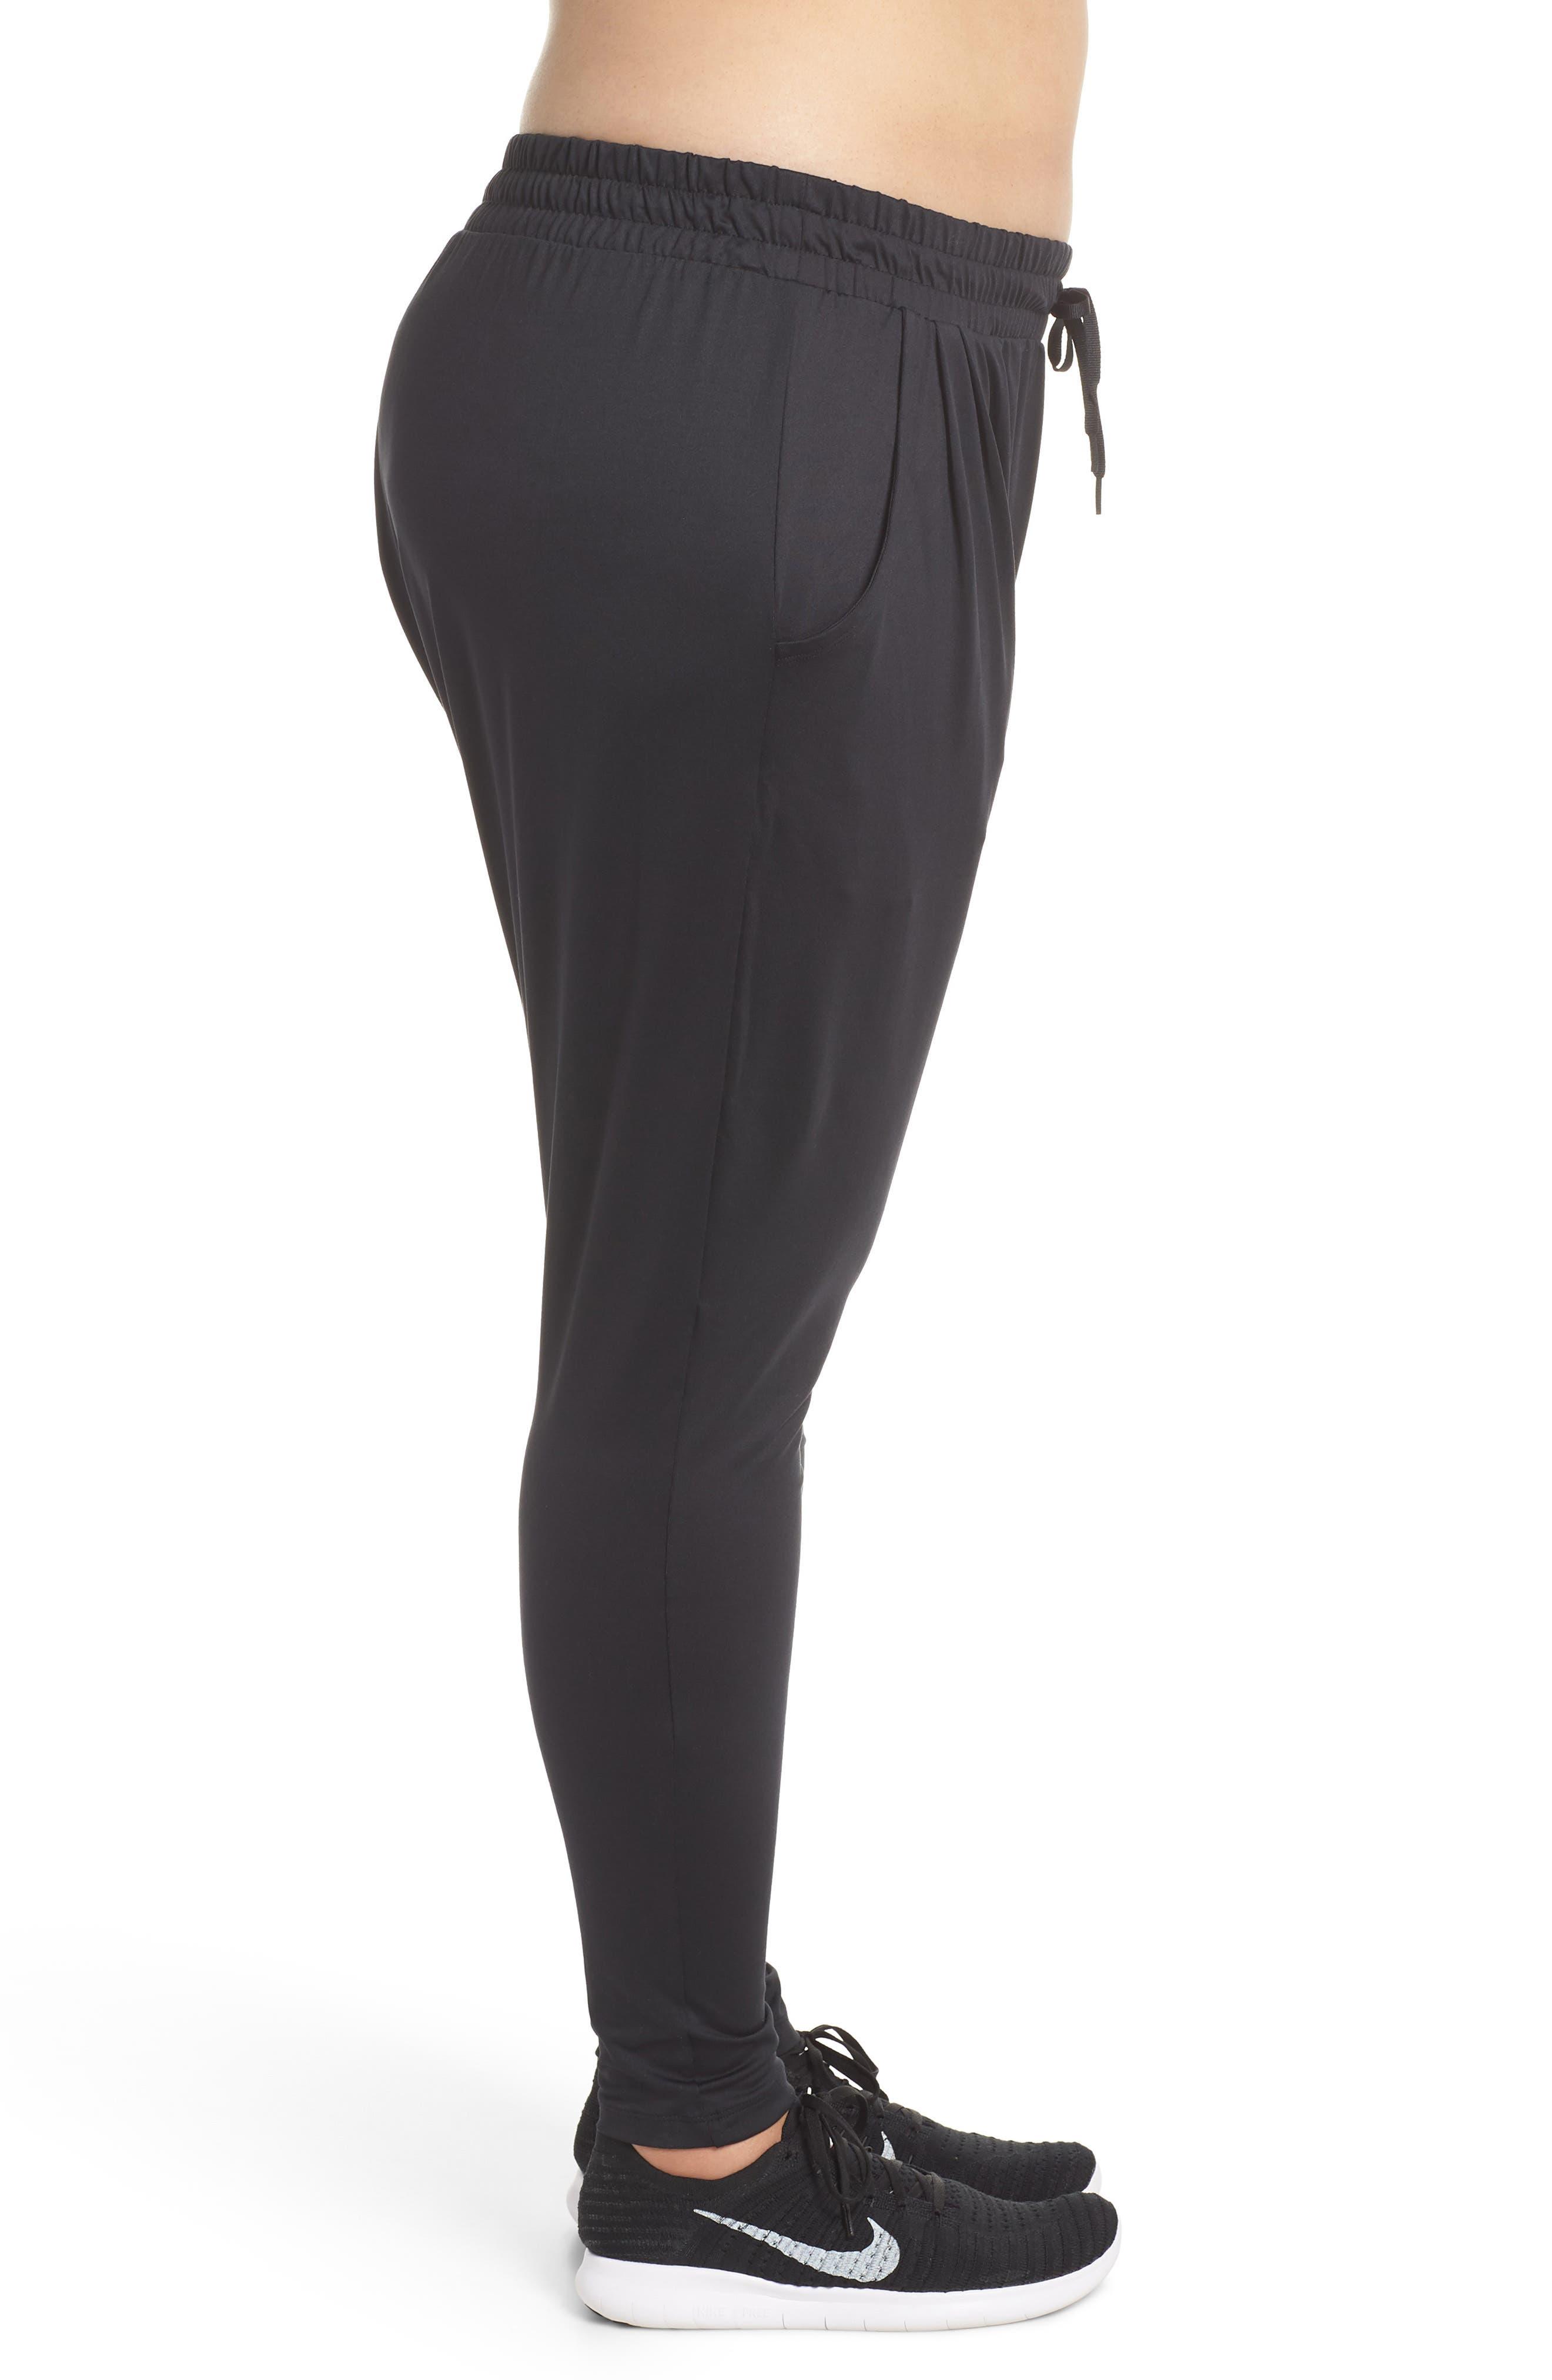 Dry Lux Flow Training Pants,                             Alternate thumbnail 3, color,                             Black/ Clear